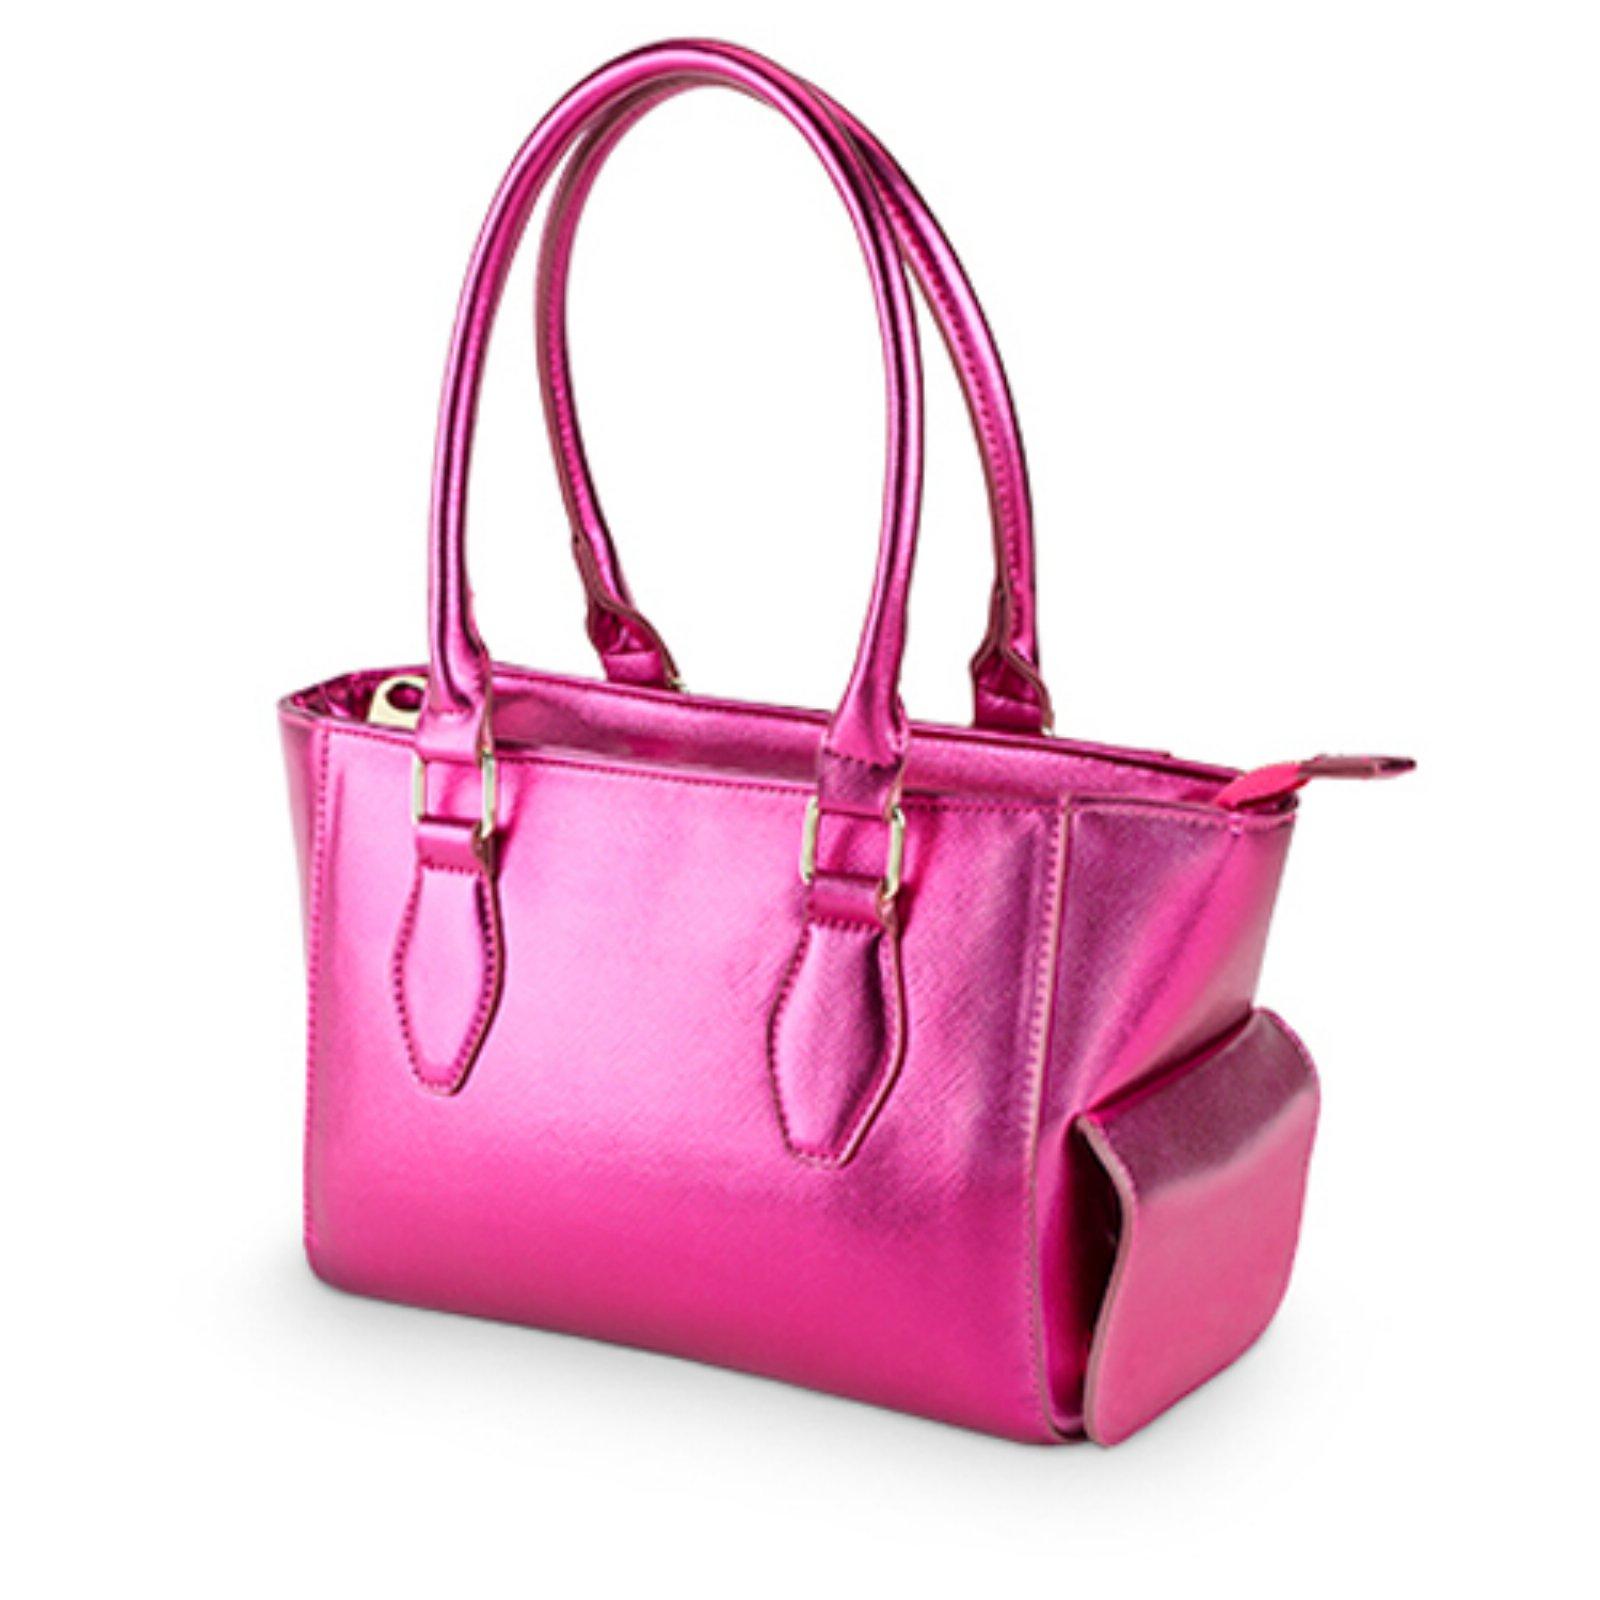 4ffaaaebb801 Blush Mini Insulated Wine Purse Metallic Hot Pink